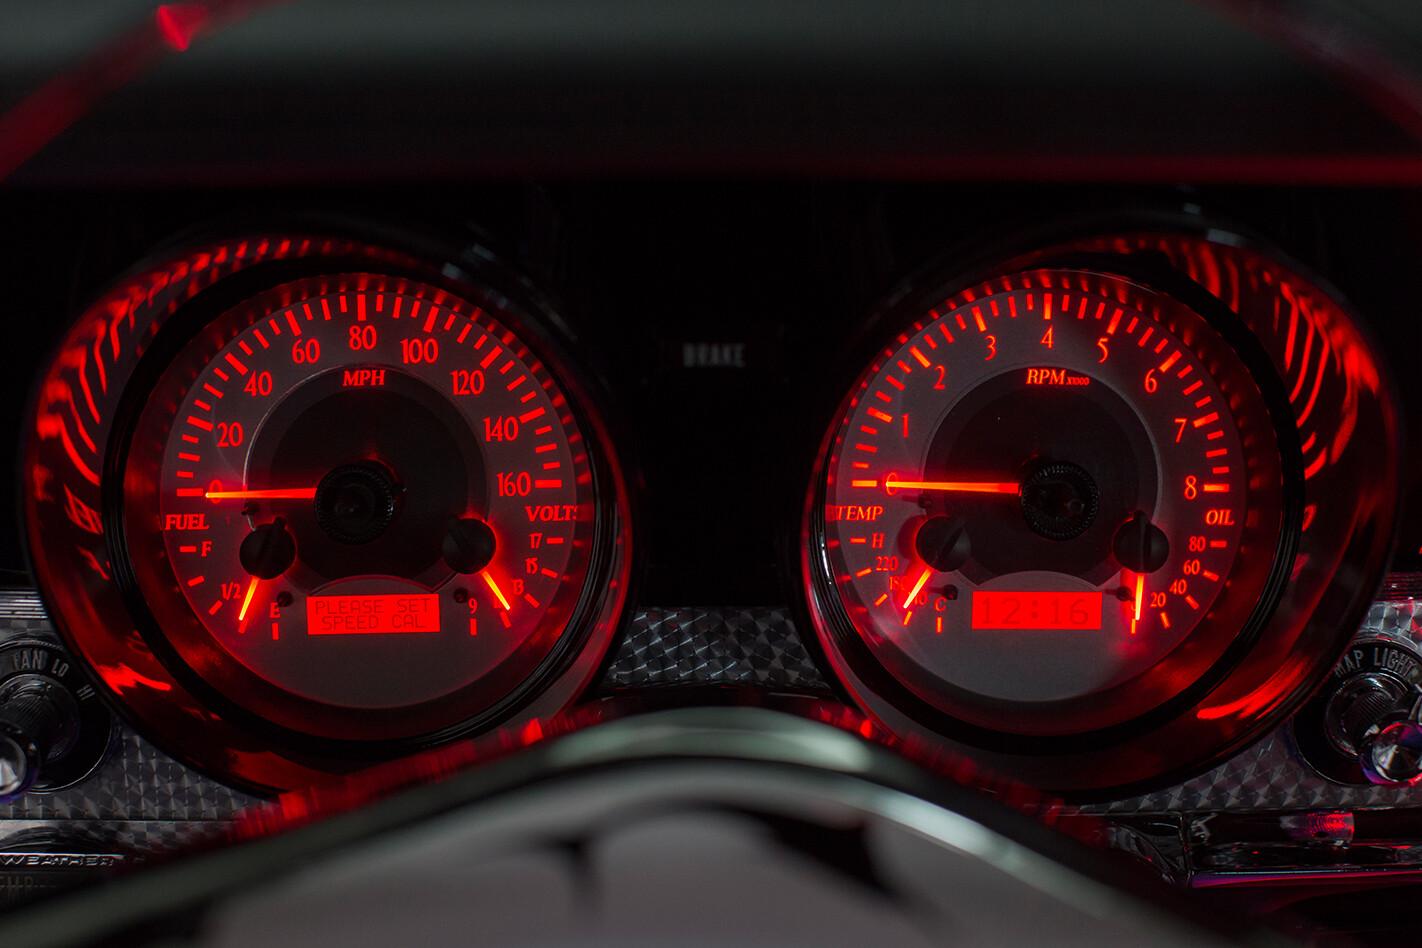 Rambler Marlin gauges